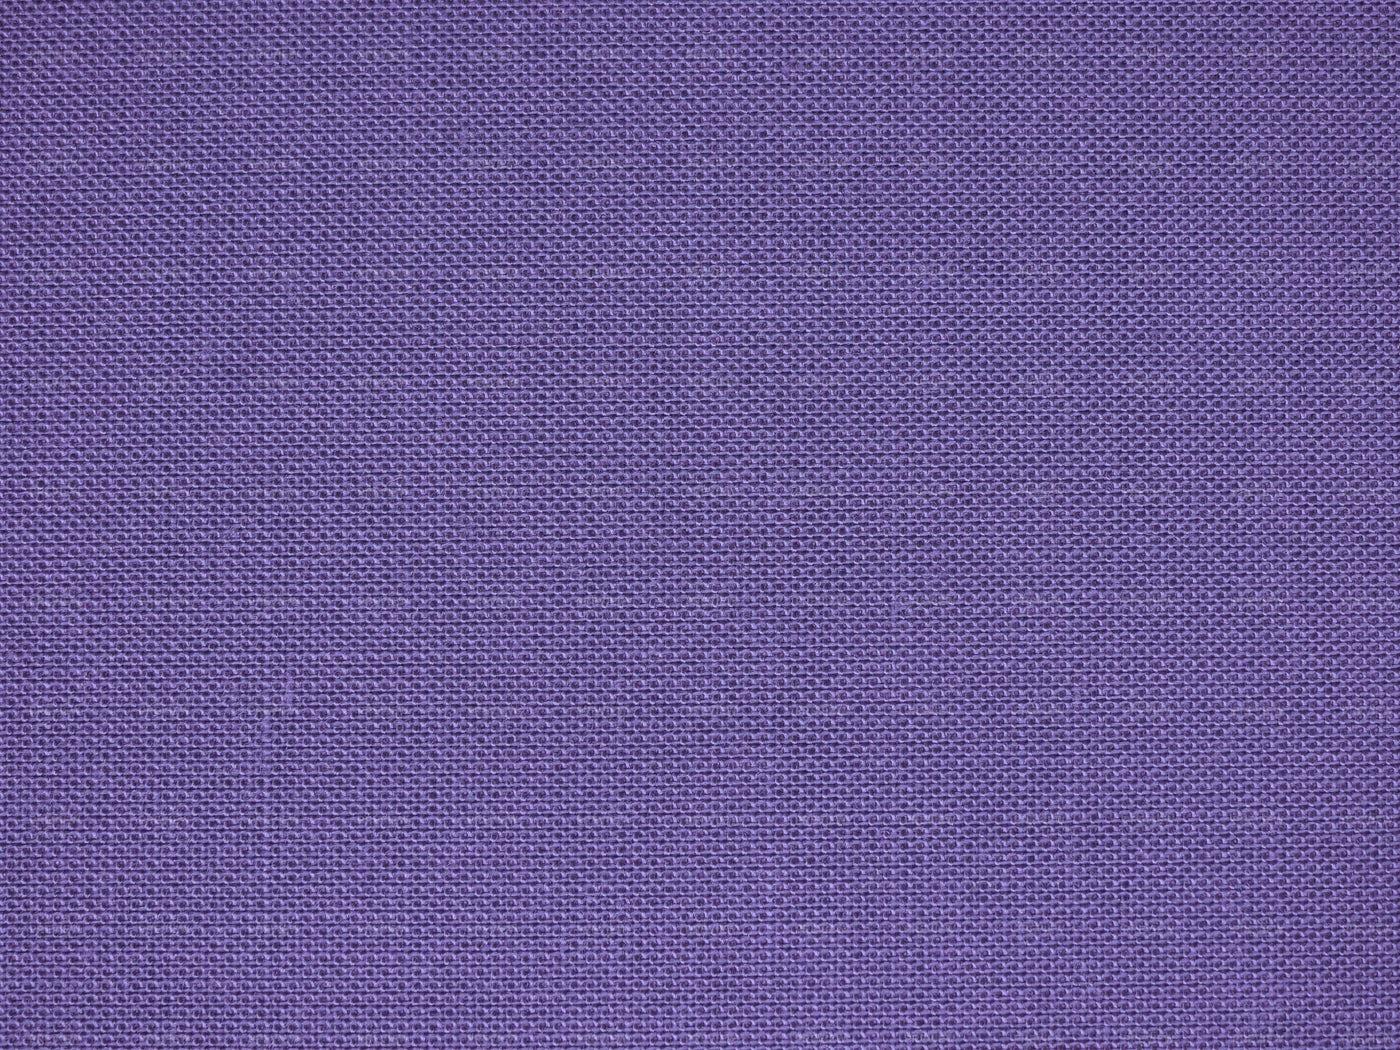 Purple Fabric Texture: Stock Photos